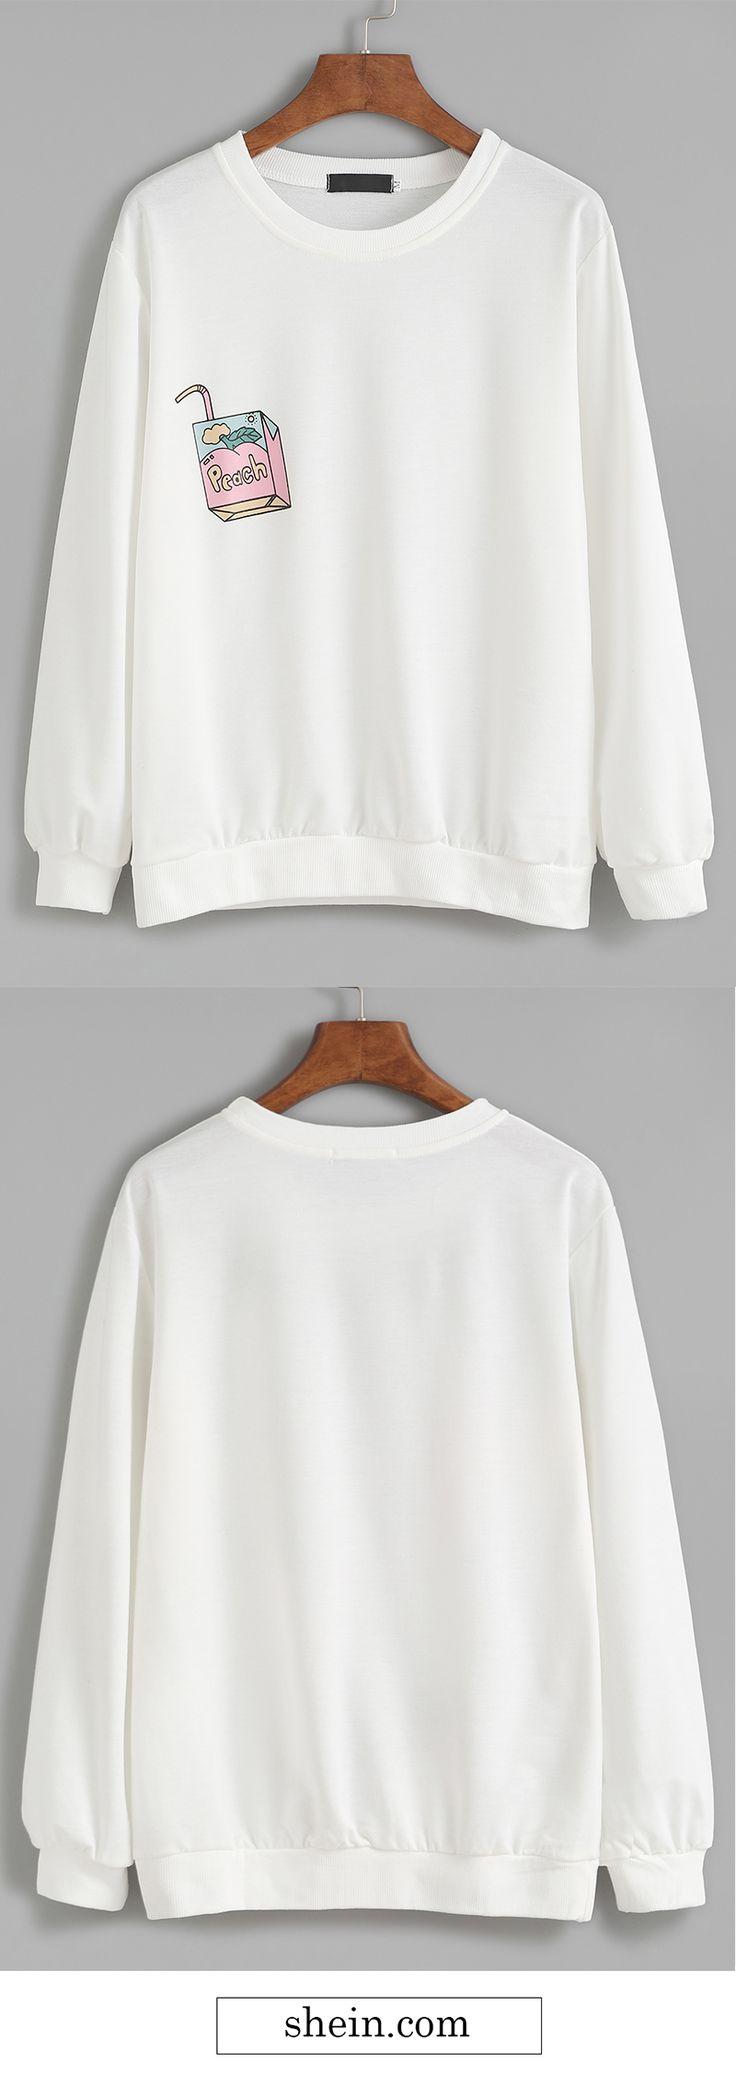 White Drawing Print Sweatshirt